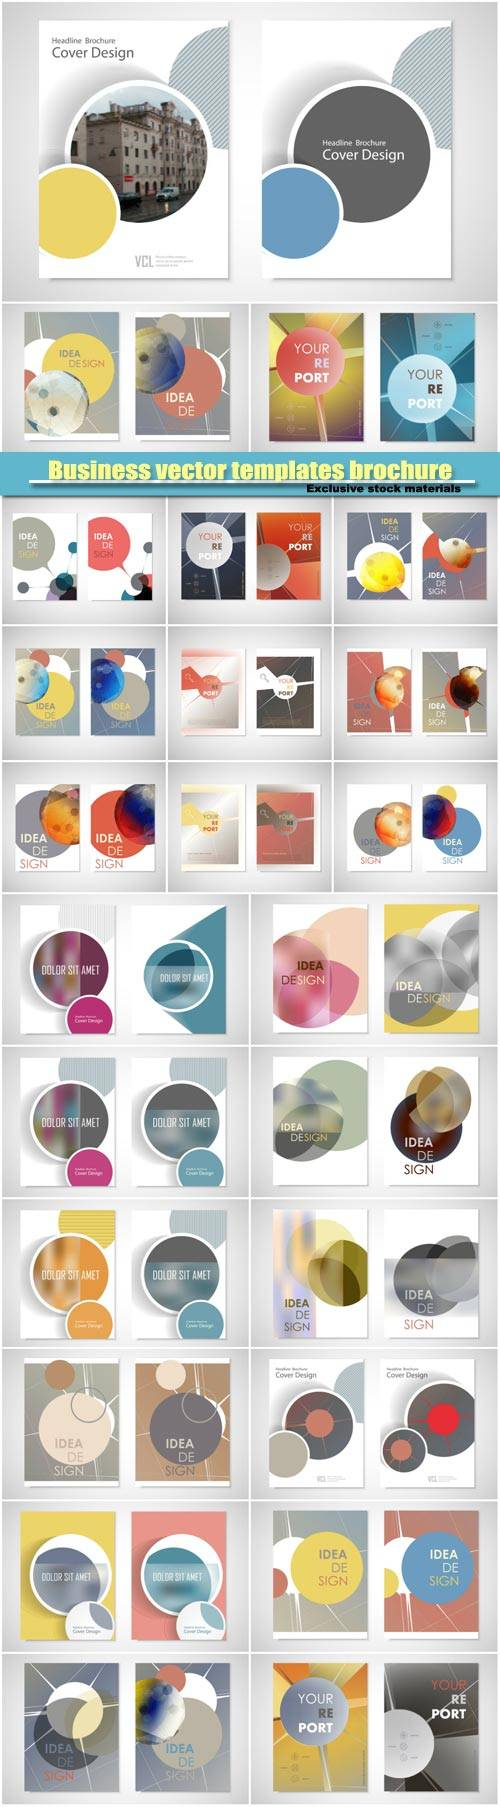 Business vector flyer templates brochure, creative figure icon